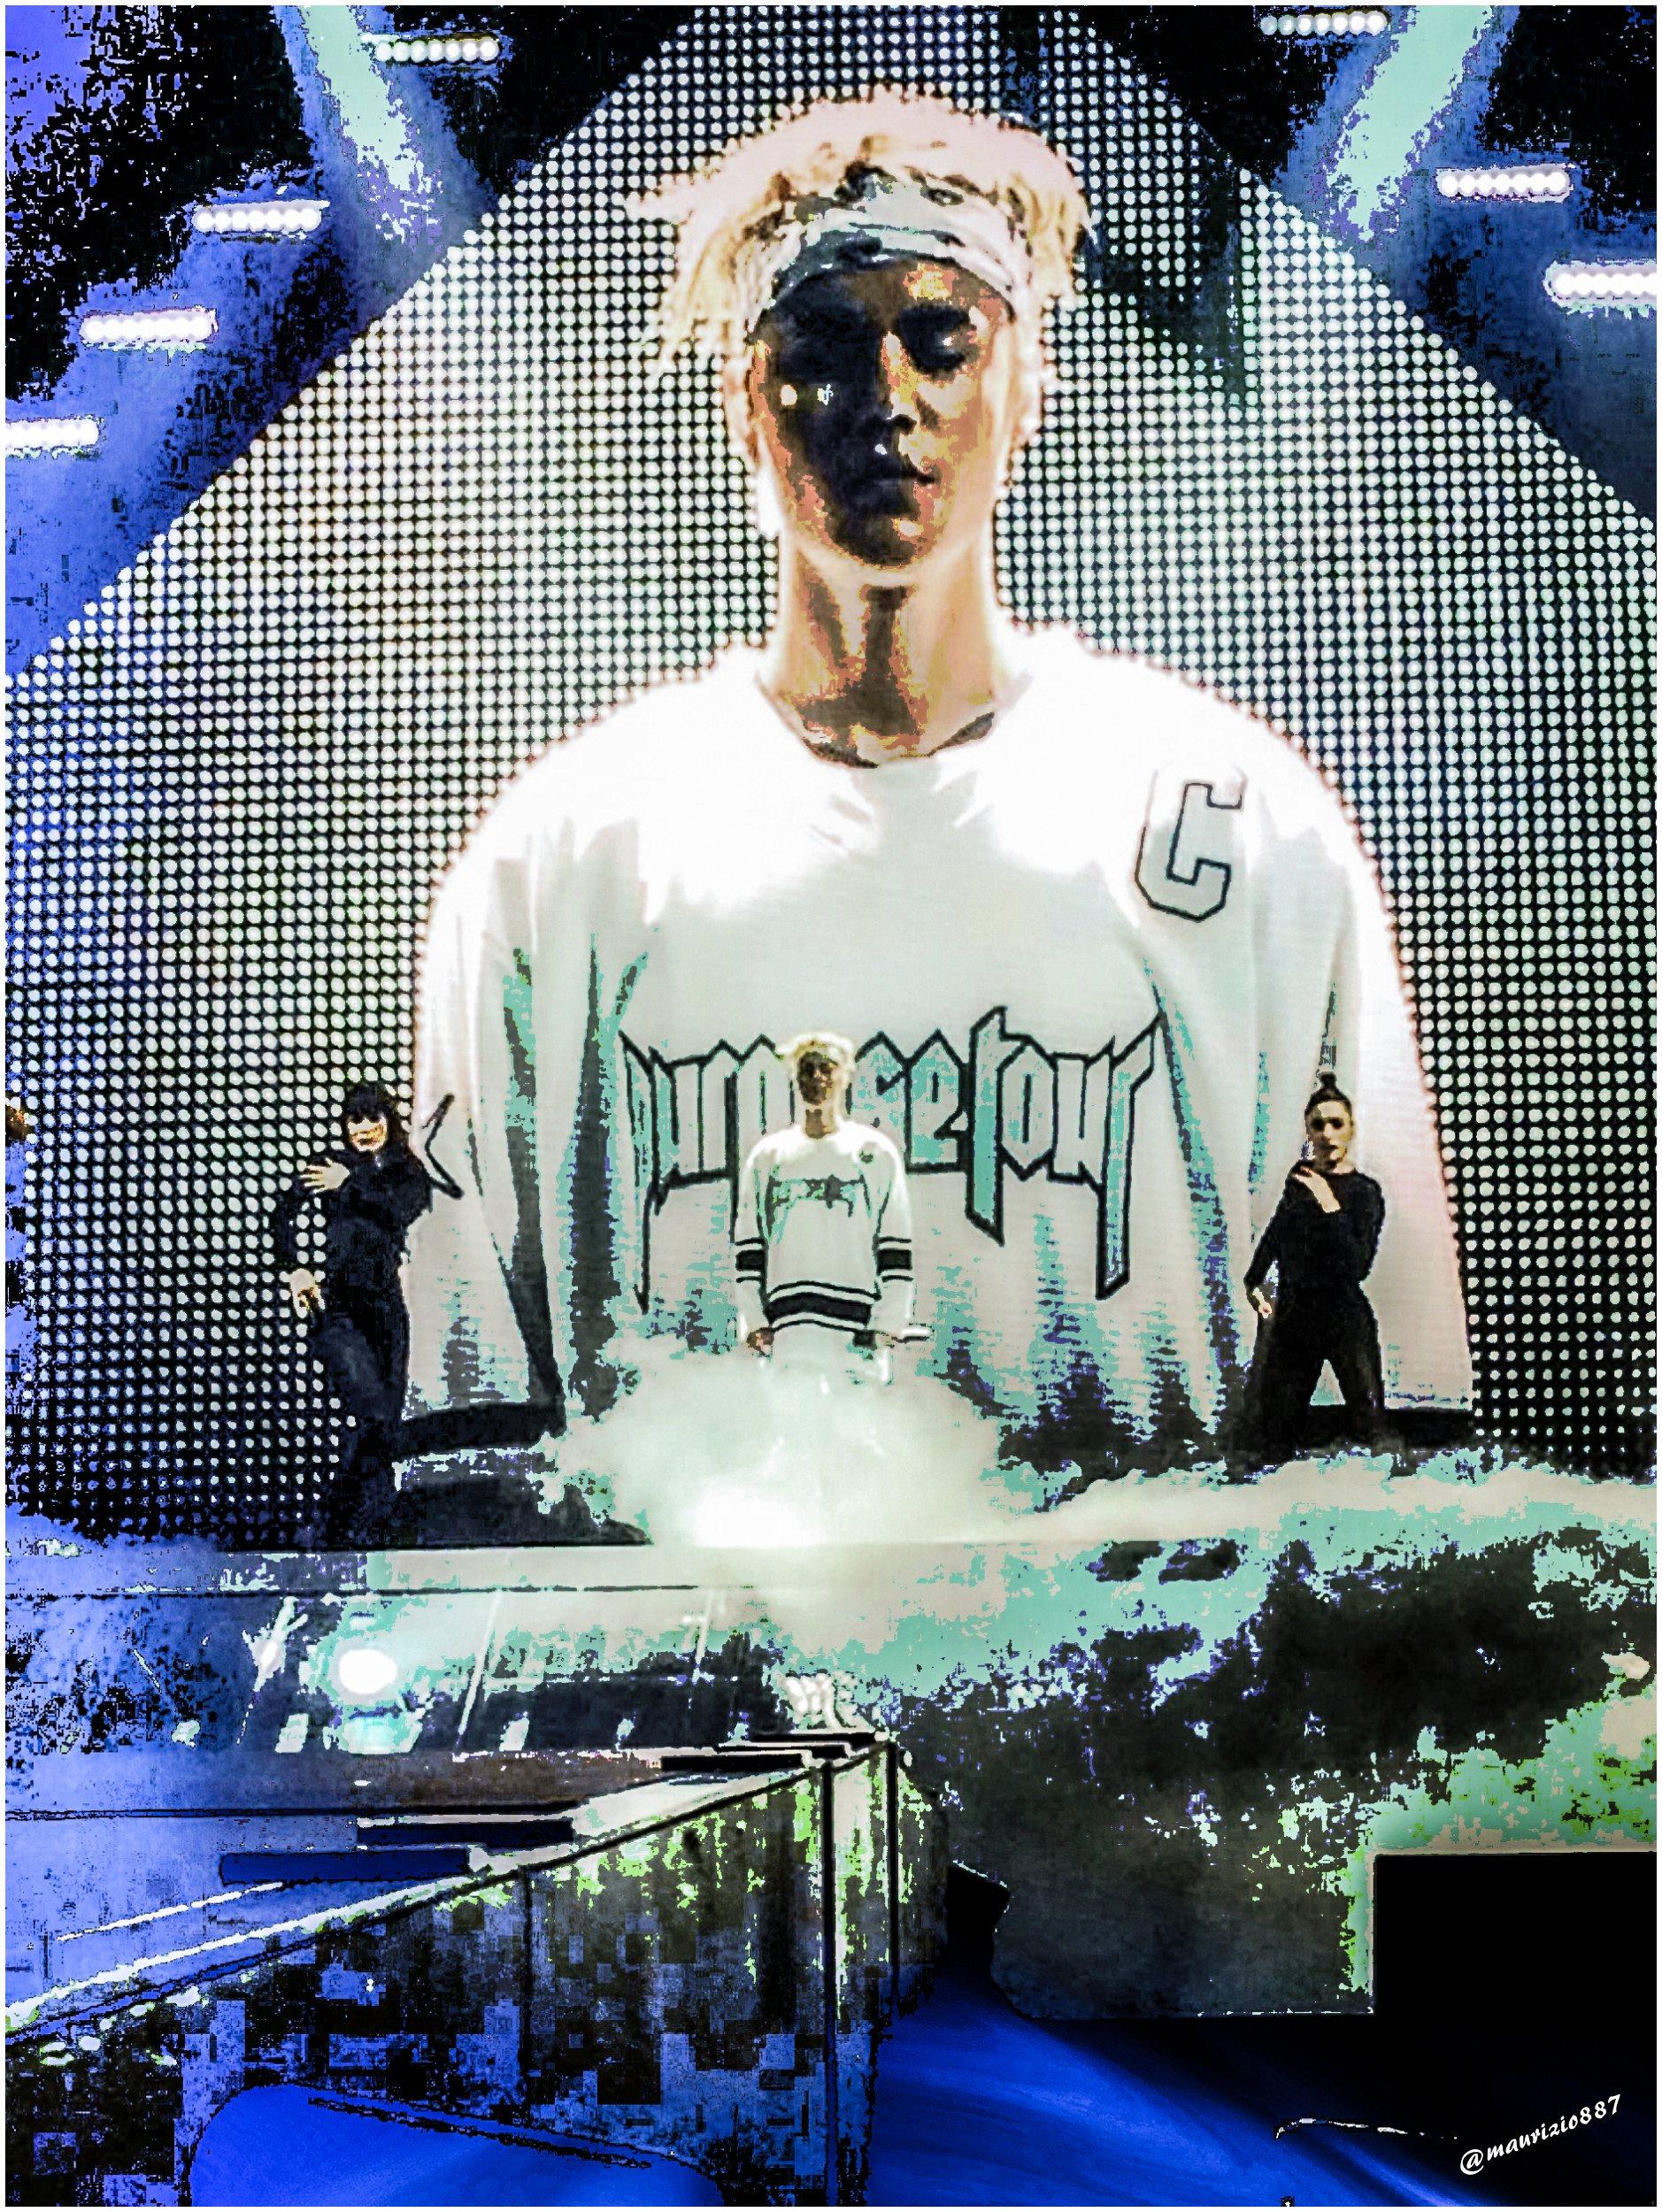 Justin Bieber Images Justin Bieber Purpose World Tour 2016 Hd